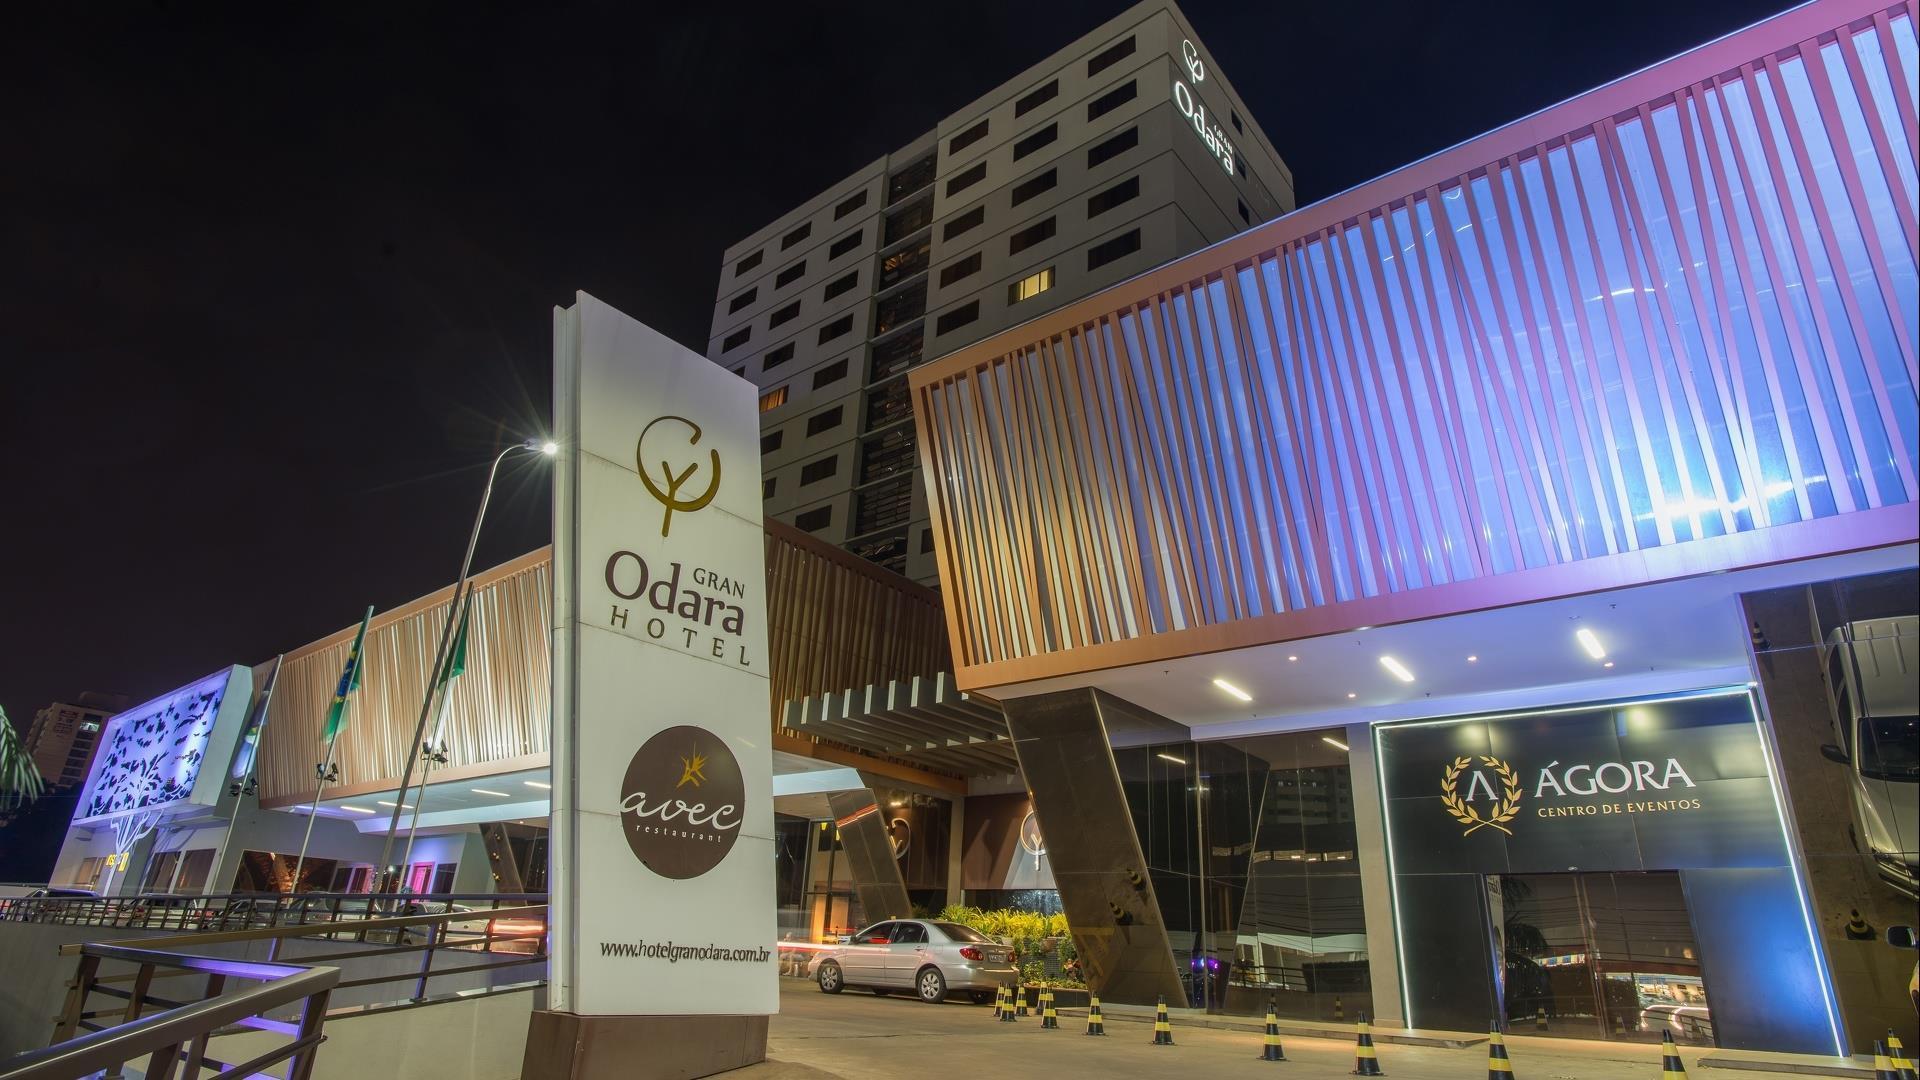 Brasilien Cuiaba: Deluxe Hotel - HotelGran Odara